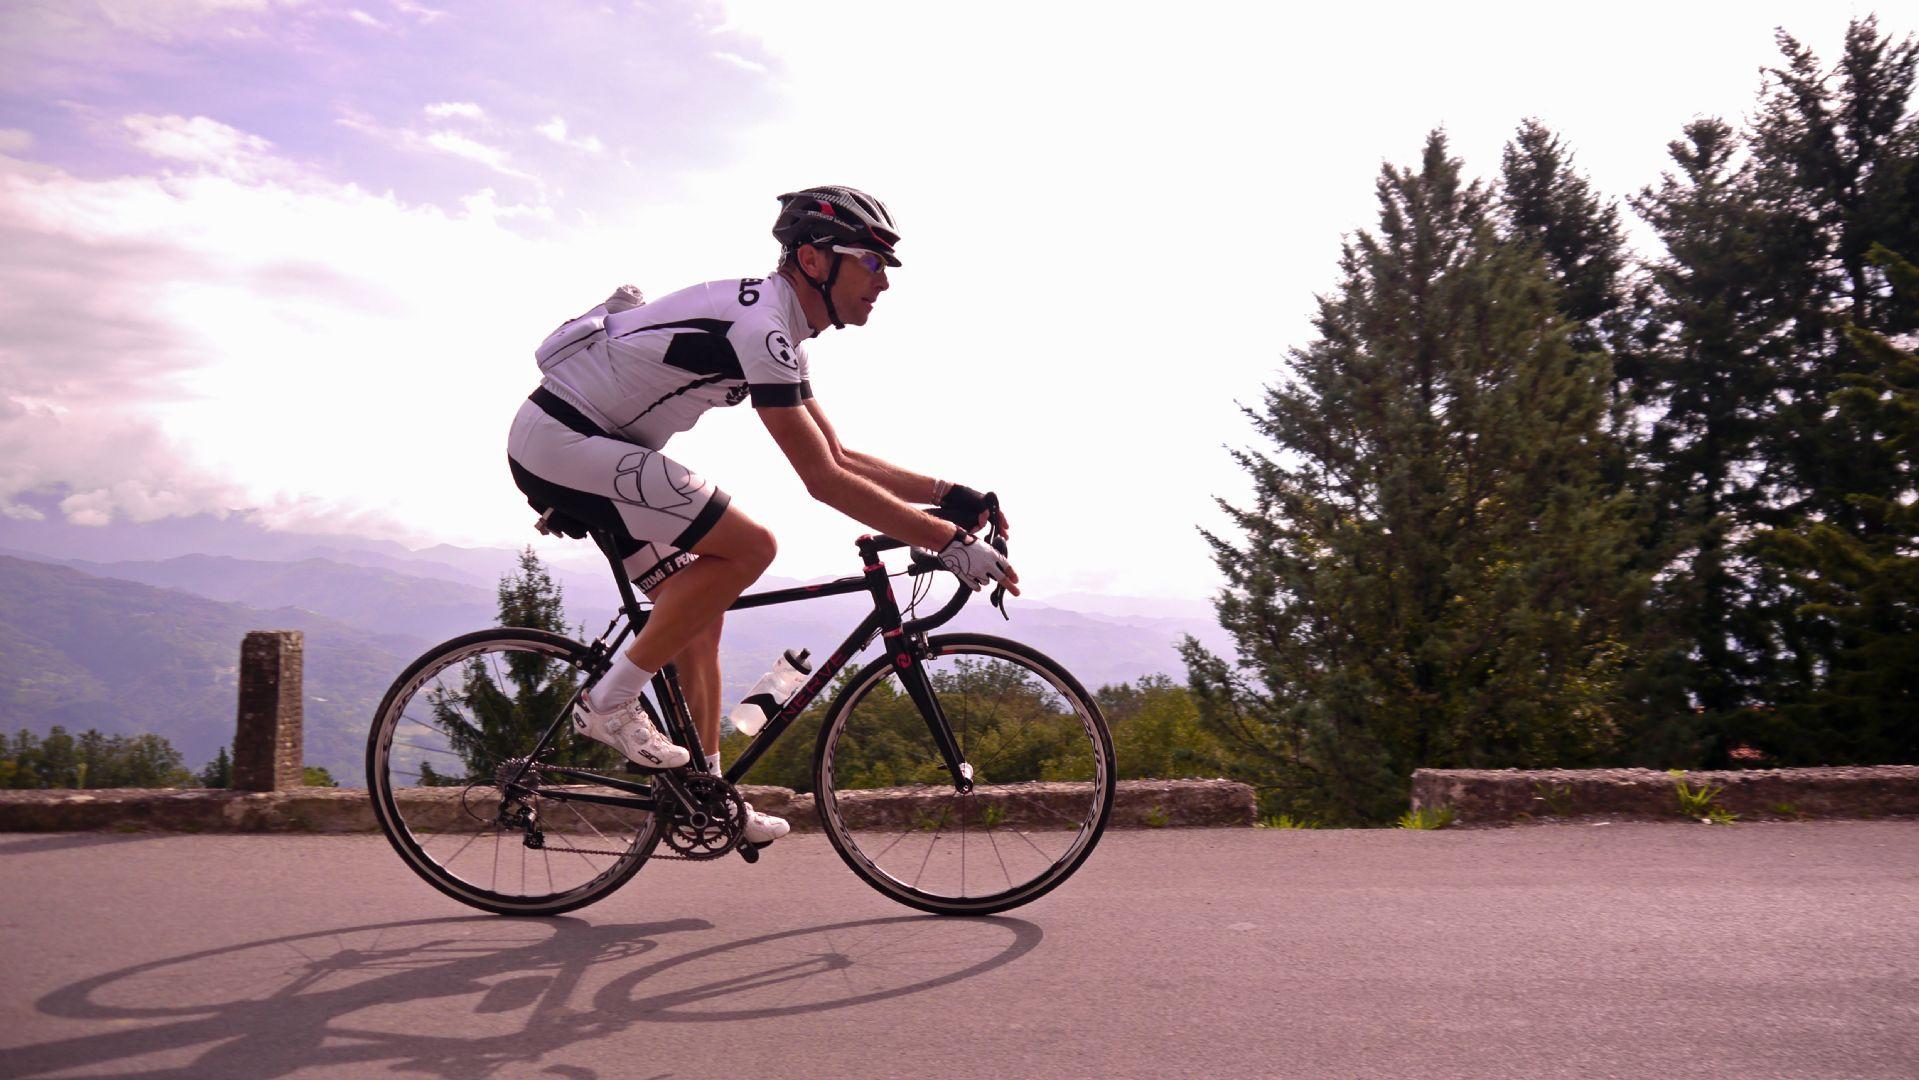 Composed (non-cropped).jpg - Italy - Garfagnana - The Mountains of Tuscany - Italia Road Cycling